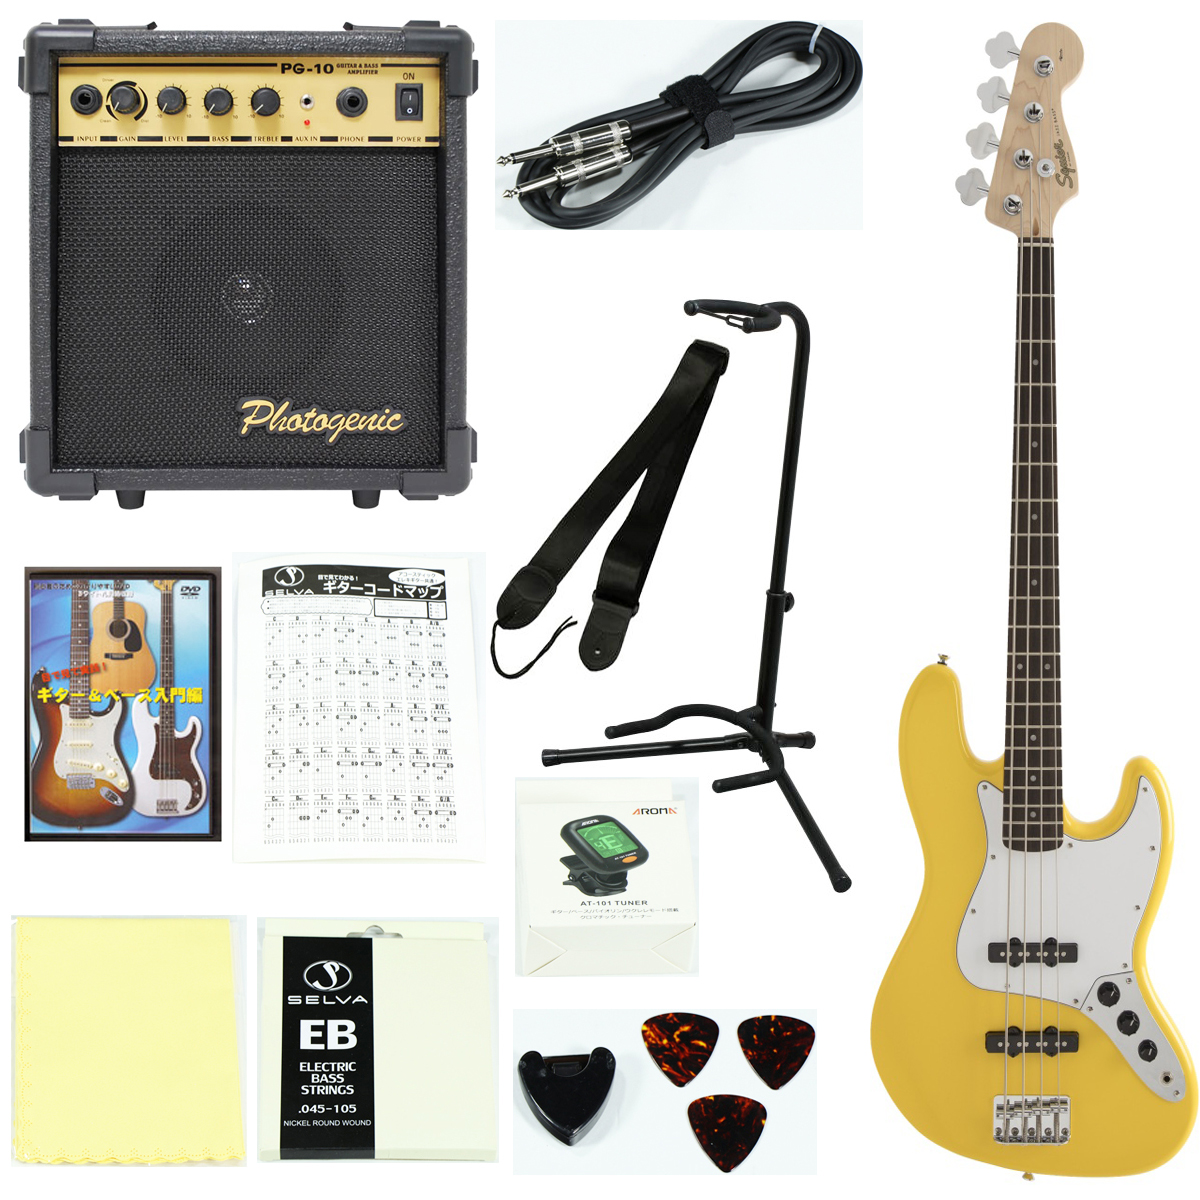 Squier by Fender / Affinity Jazz Bass Laurel Fingerboard Graffiti Yellow【エレキベース入門セット】初心者 入門セット 初心者セット